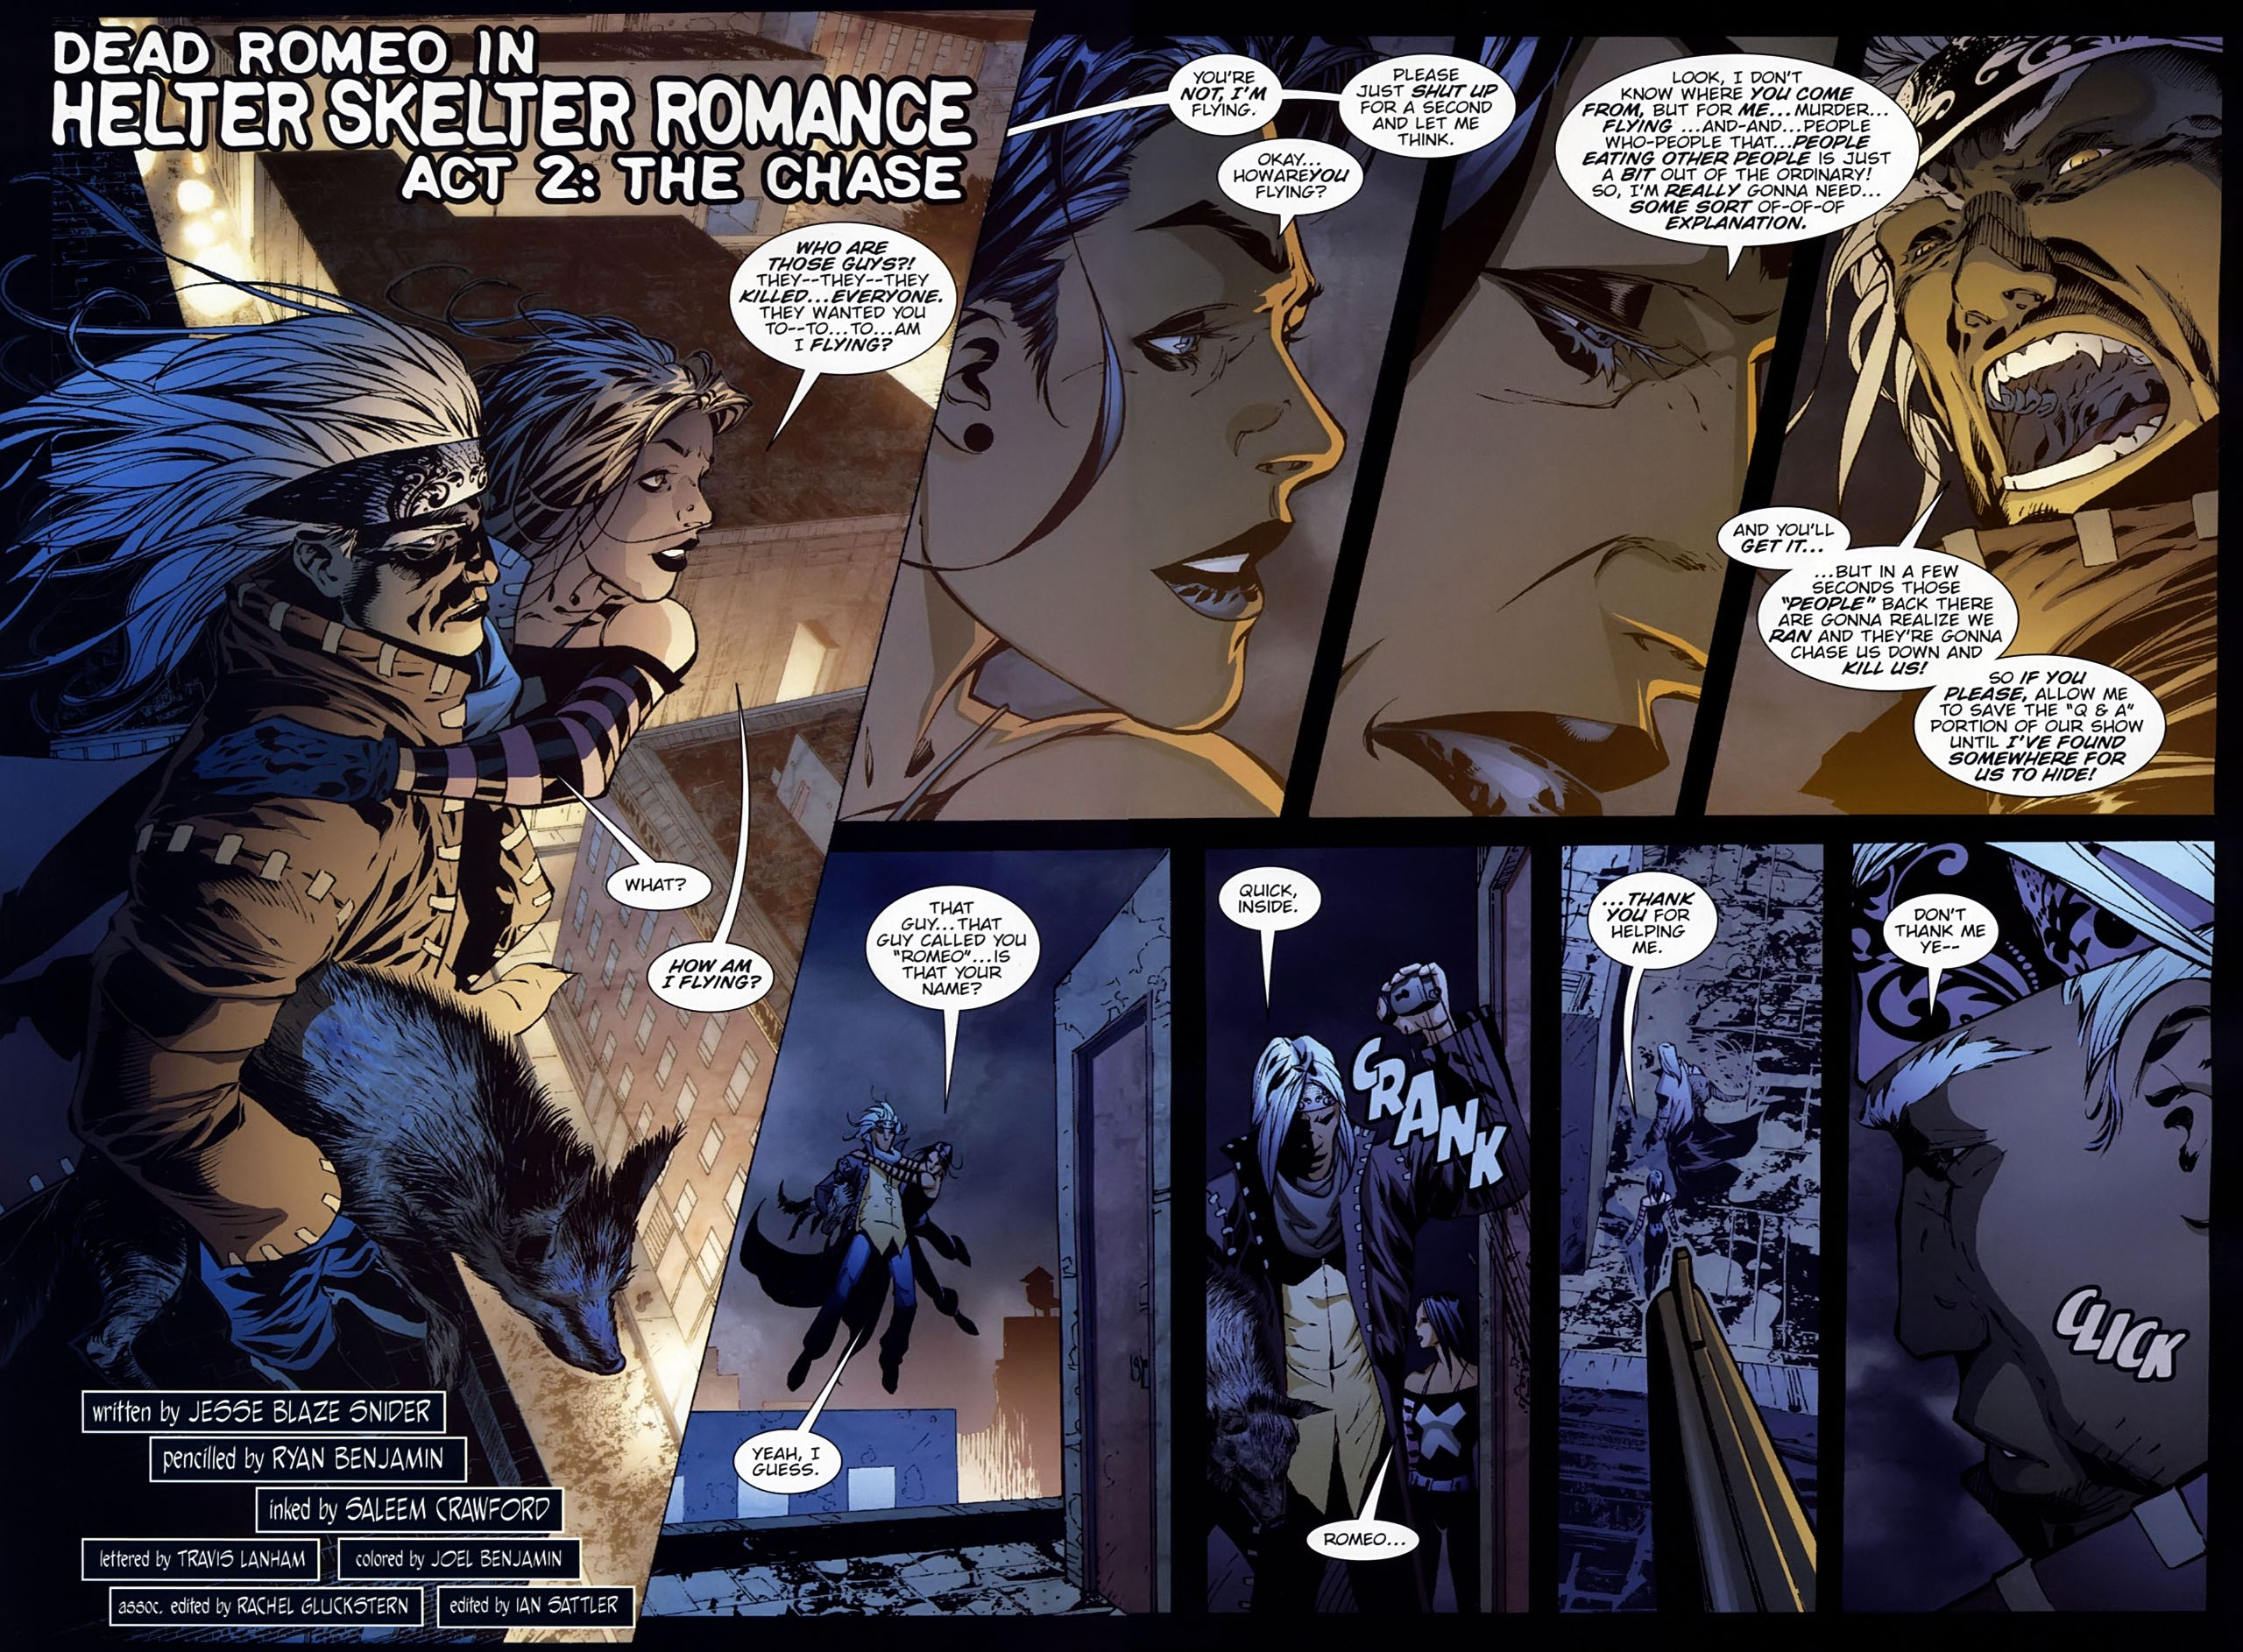 Read online Dead Romeo comic -  Issue #2 - 5